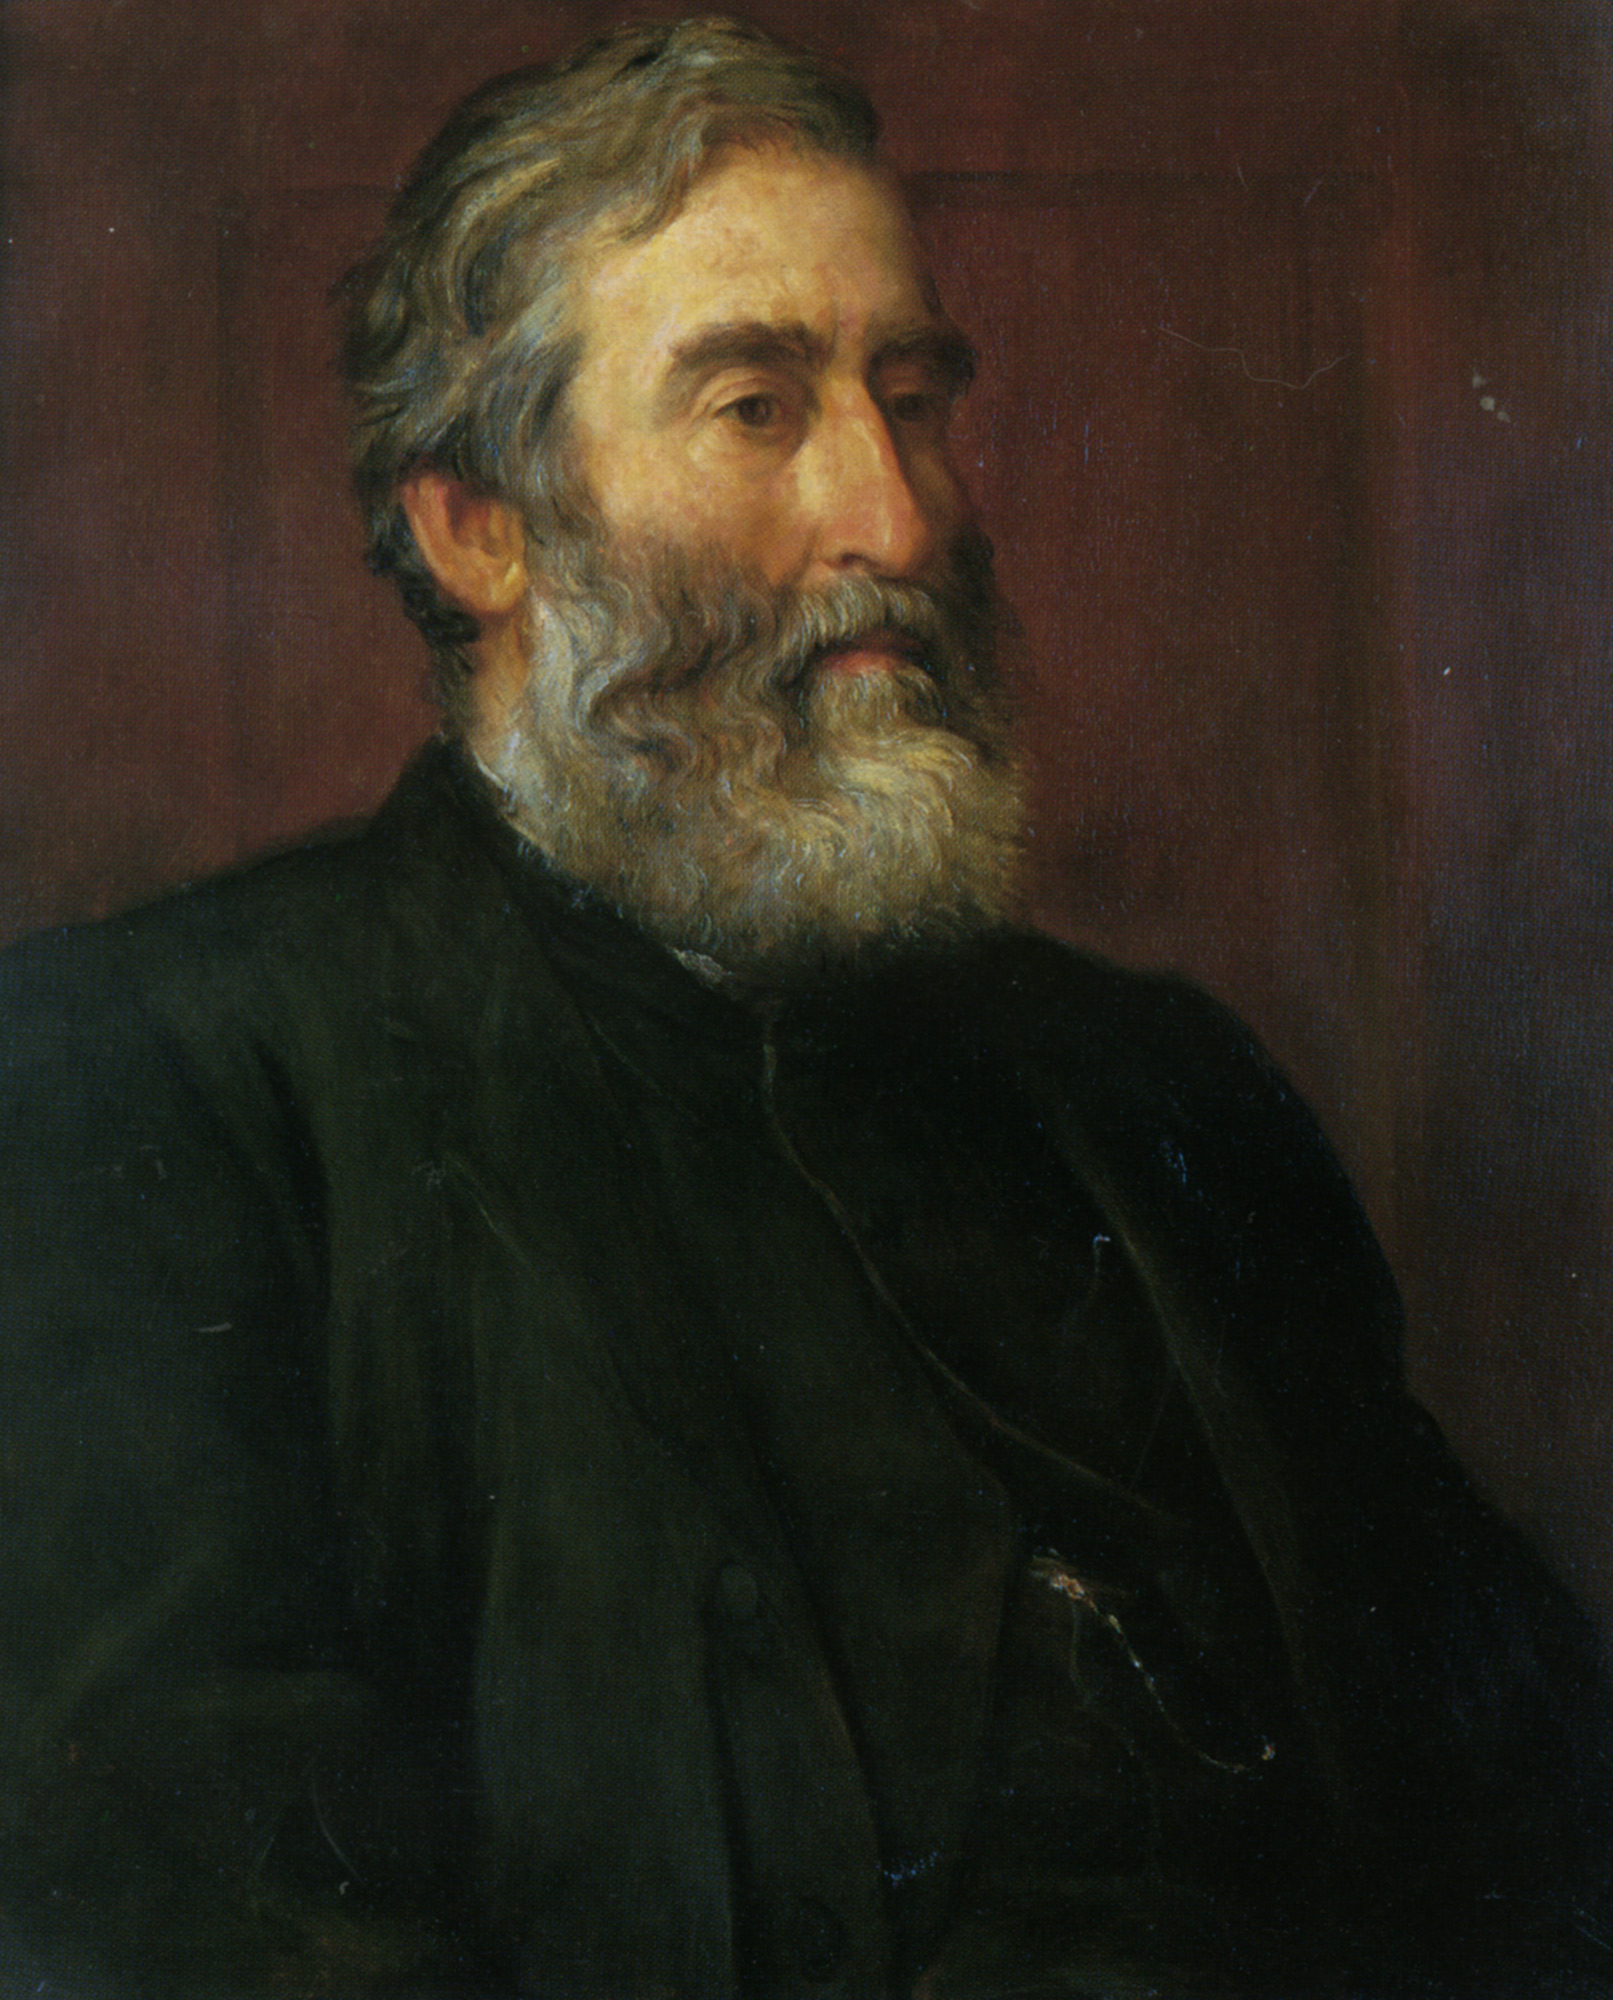 Portrait of the reverend Harry Jones :: George Frederick Watts - men's portraits 19th century (first half) ôîòî